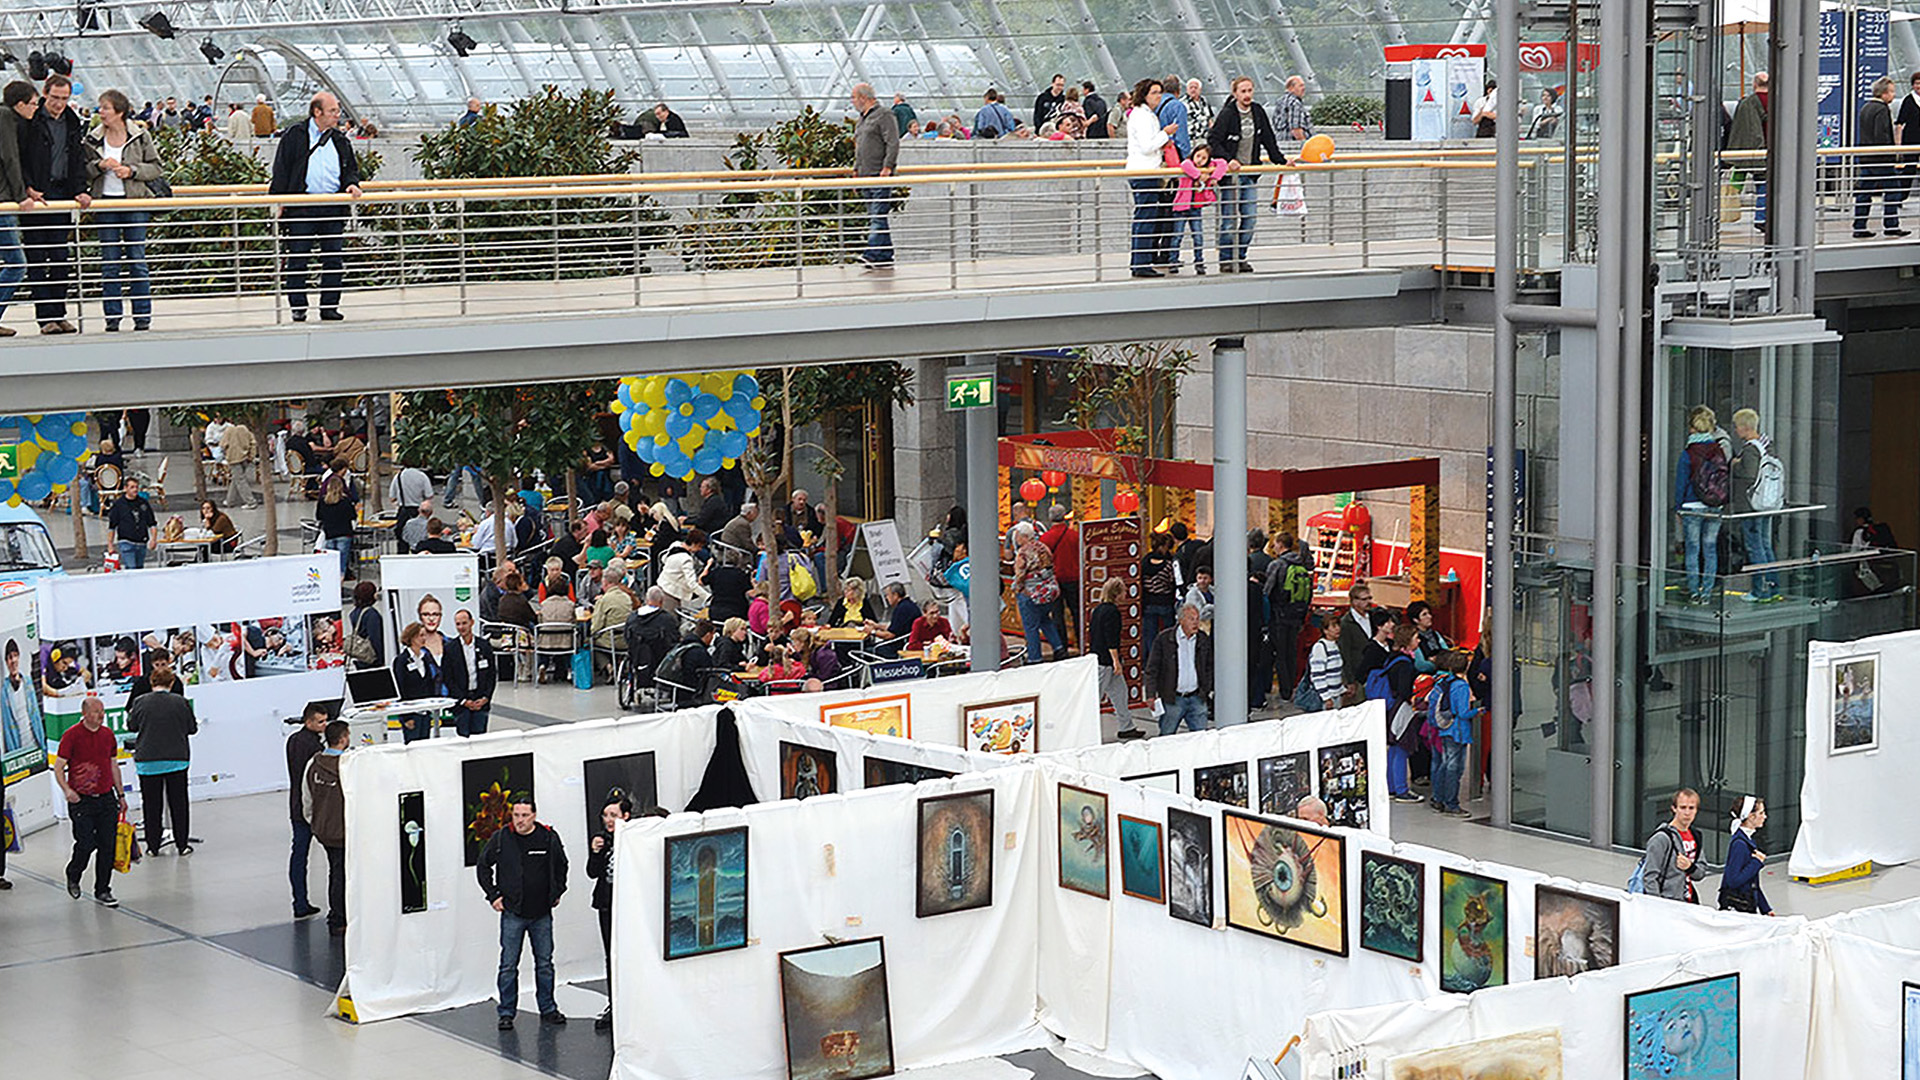 Airbrush-Fachverband e.V.– Airbrush Expo Leipzig 2015